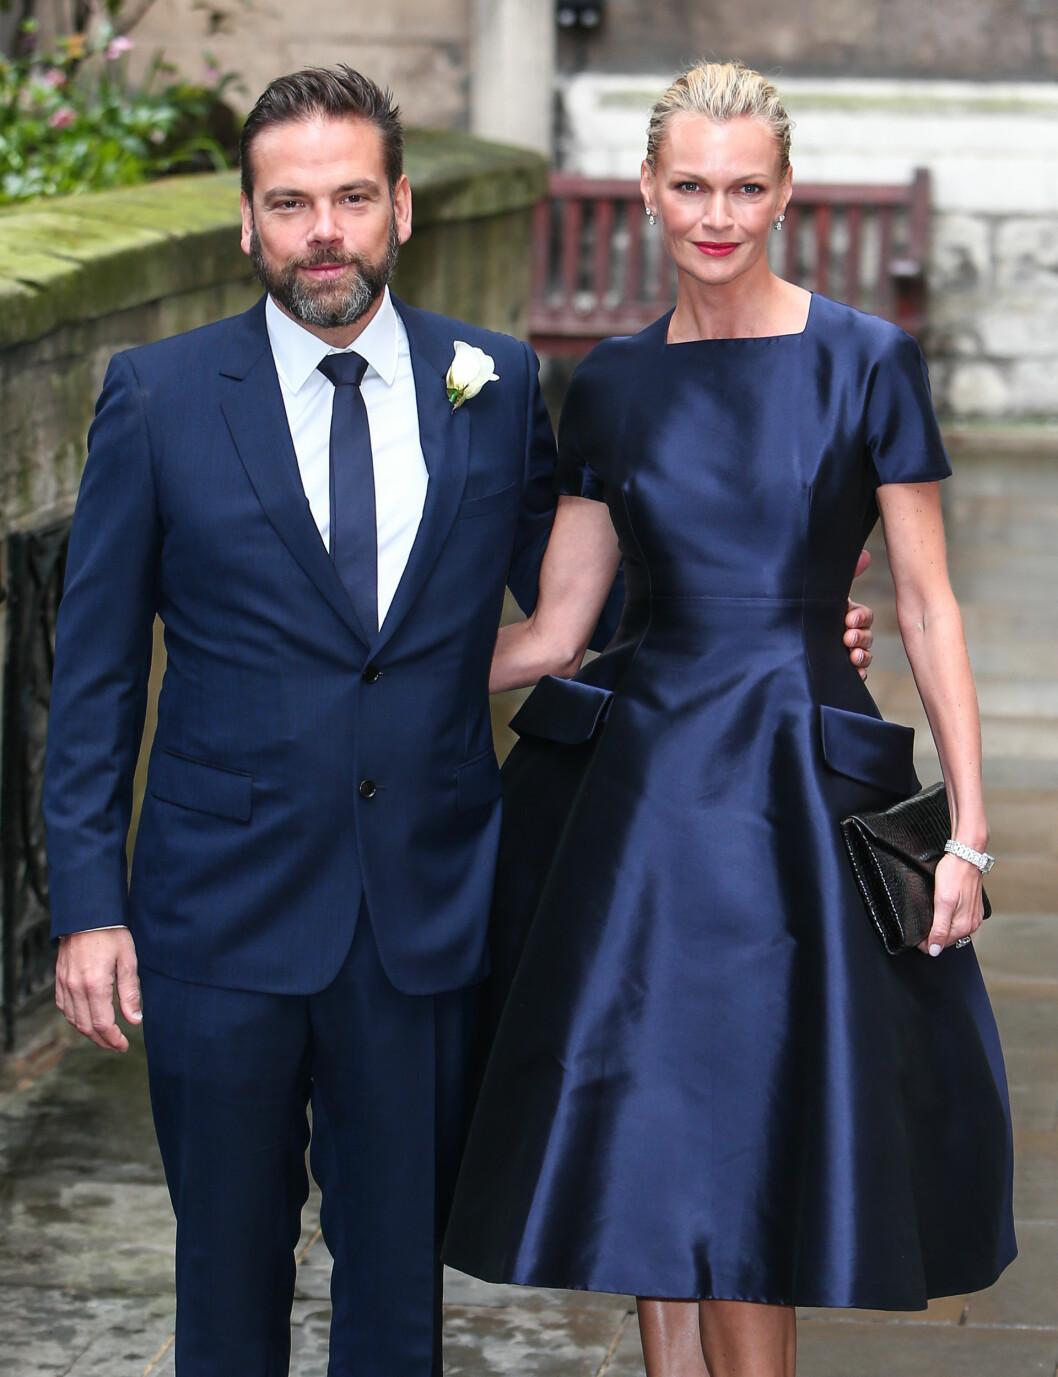 <strong>TOK MED KONA:</strong> Rupert Murdochs sønn Lachlat og kona Sarah. Foto: wenn.com